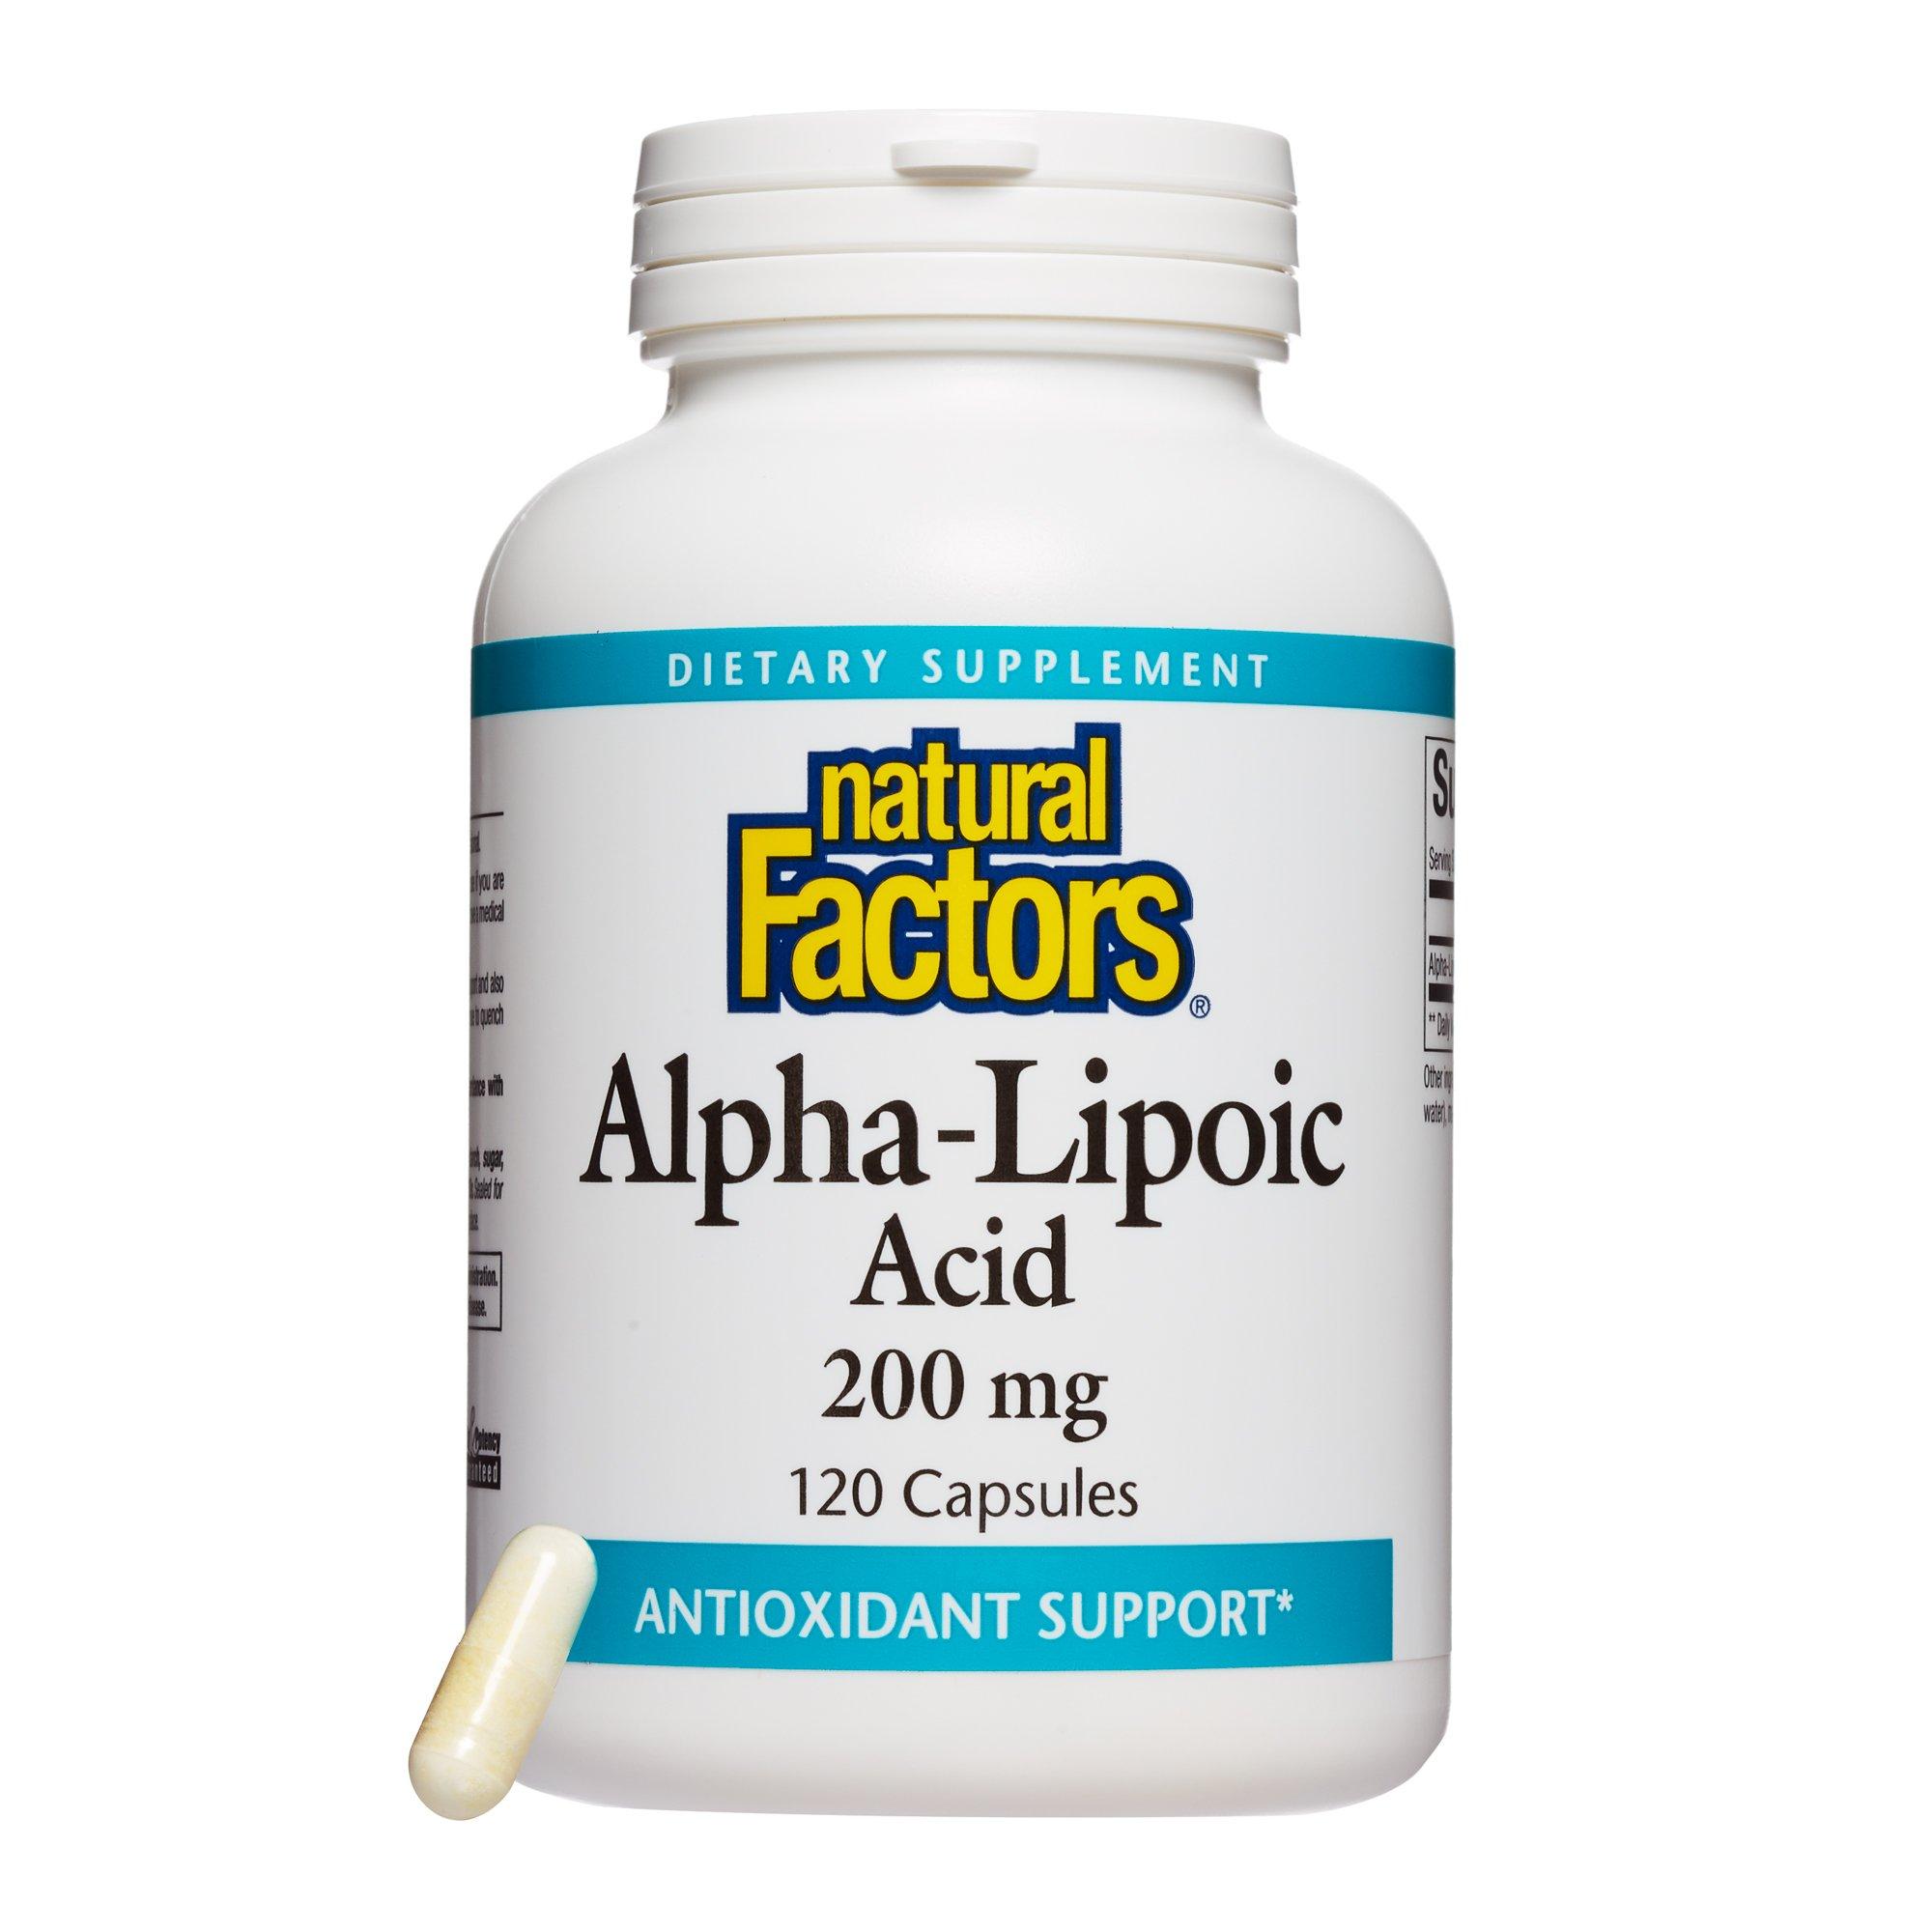 Natural Factors - Alpha-Lipoic Acid 200mg, Broad Spectrum Antioxidant Support to Restore Natural Defense Against Free Radical Damage, 120 Capsules